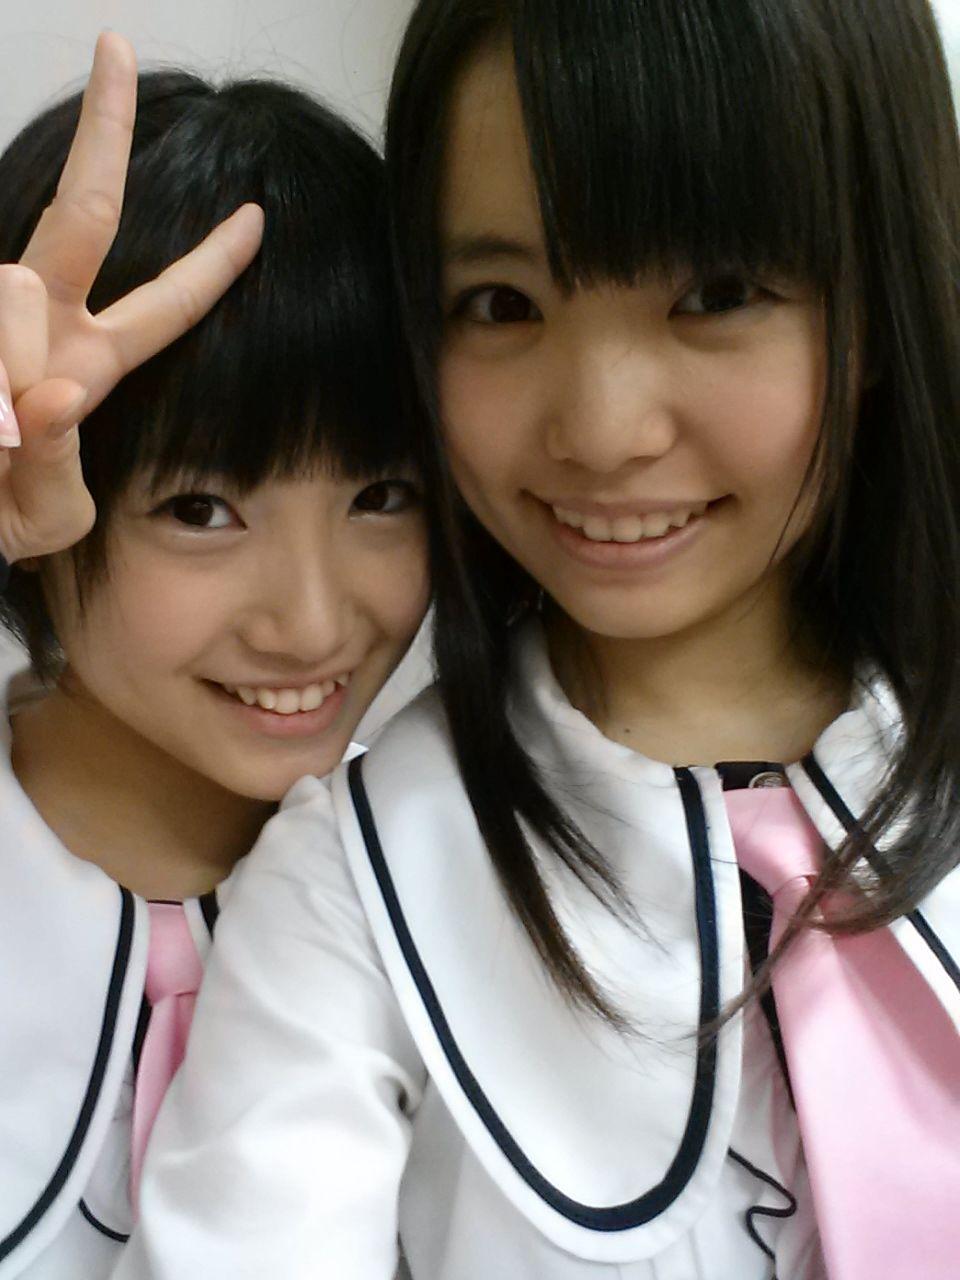 http://livedoor.blogimg.jp/otohaeika/imgs/1/2/1212c590.jpg